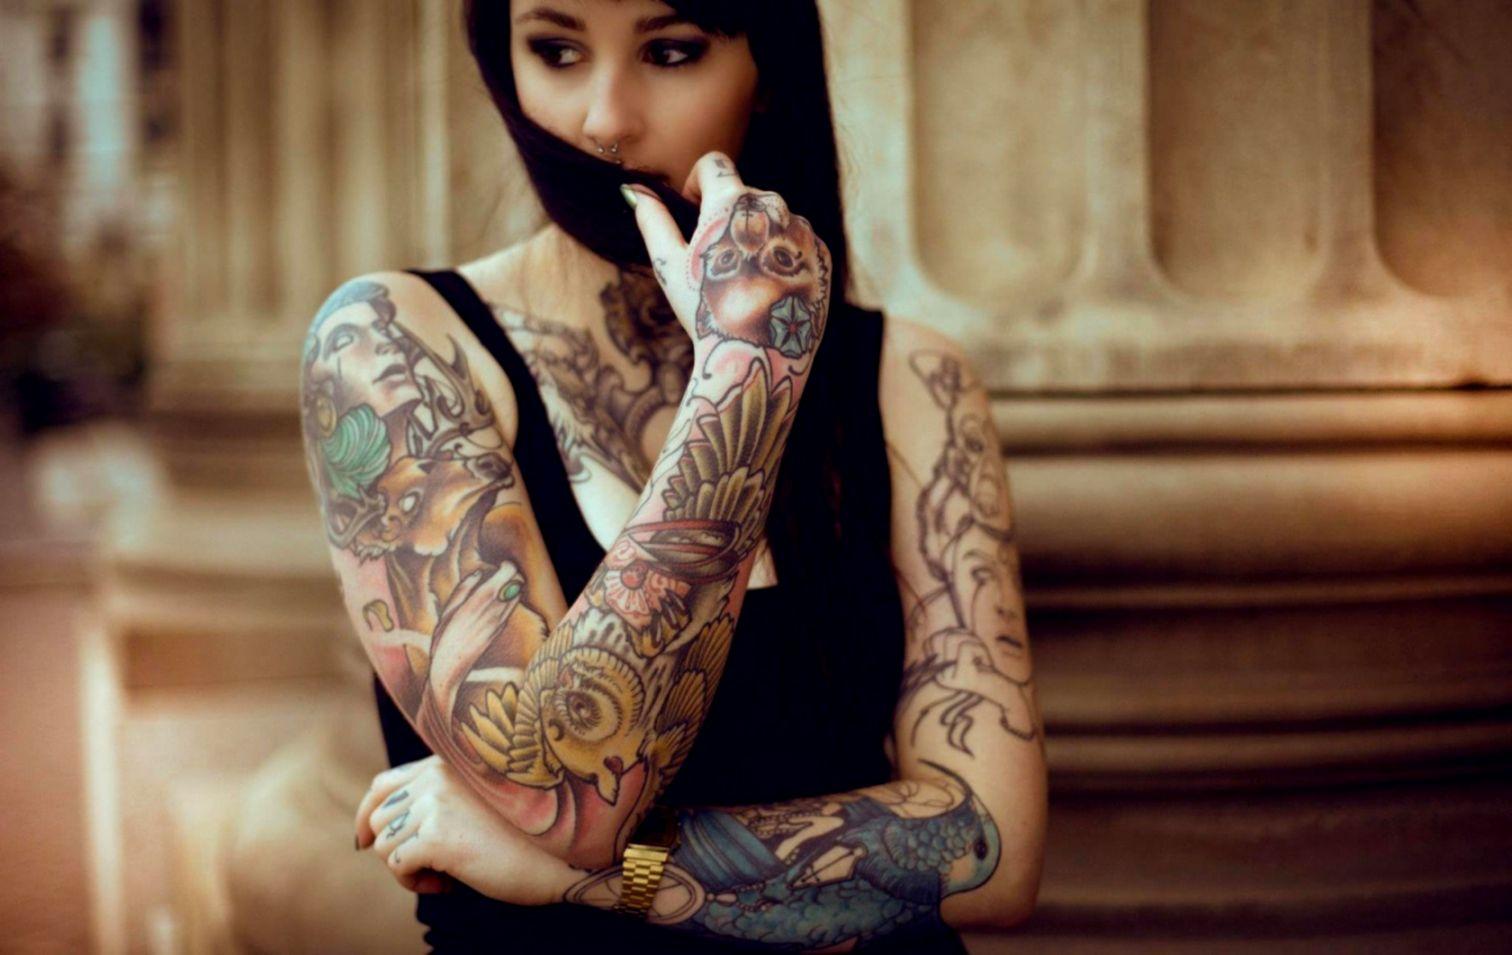 Best Of Tattooed Girl Wallpaper Full Hd Pictures - Tattoo Girls Wallpaper Hd - HD Wallpaper